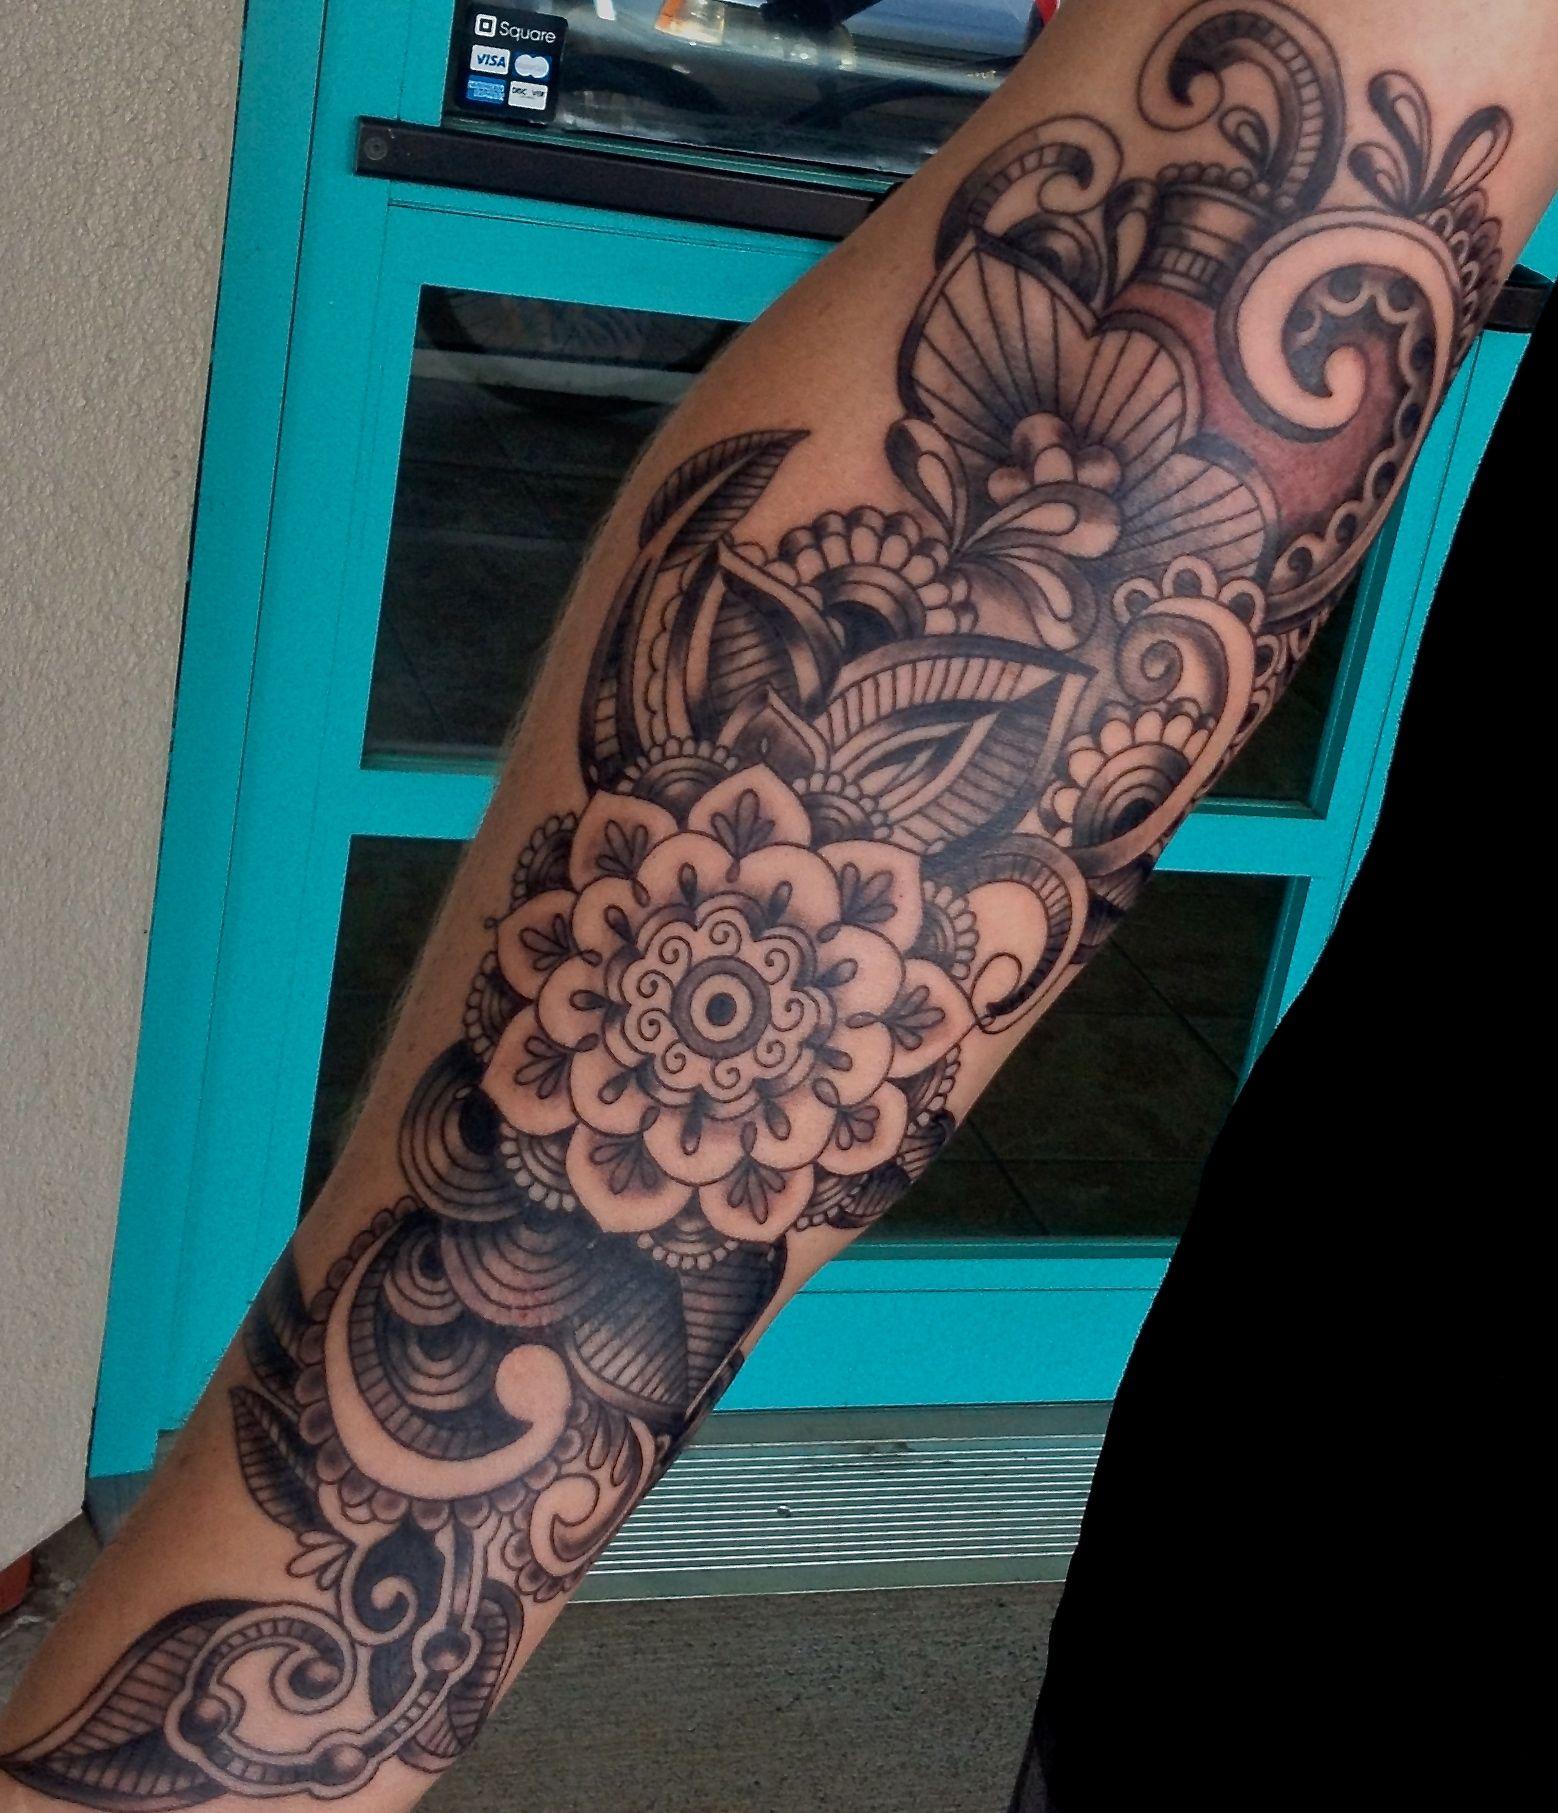 paisley.jpg 1,558×1,813 pixels Paisley tattoo sleeve